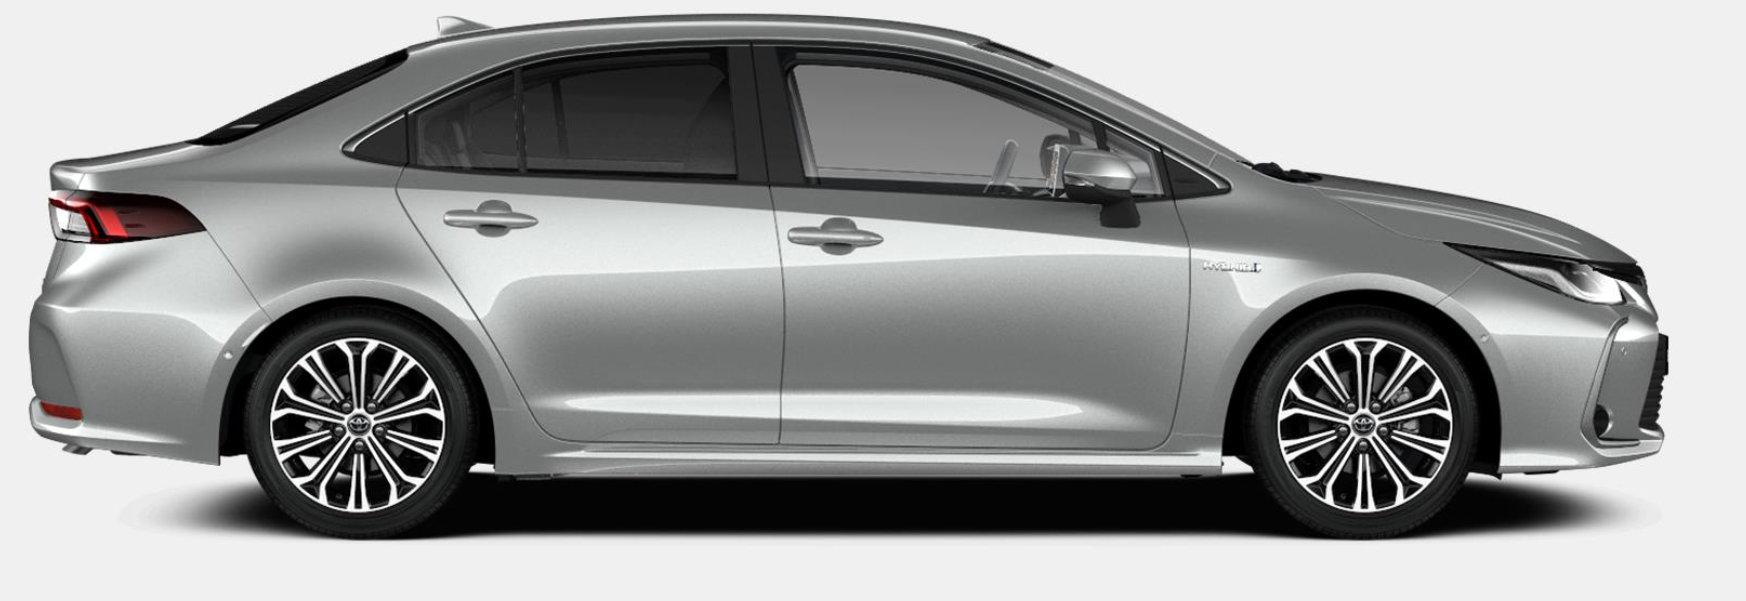 Toyota-Corolla-Sedan-leasen-2